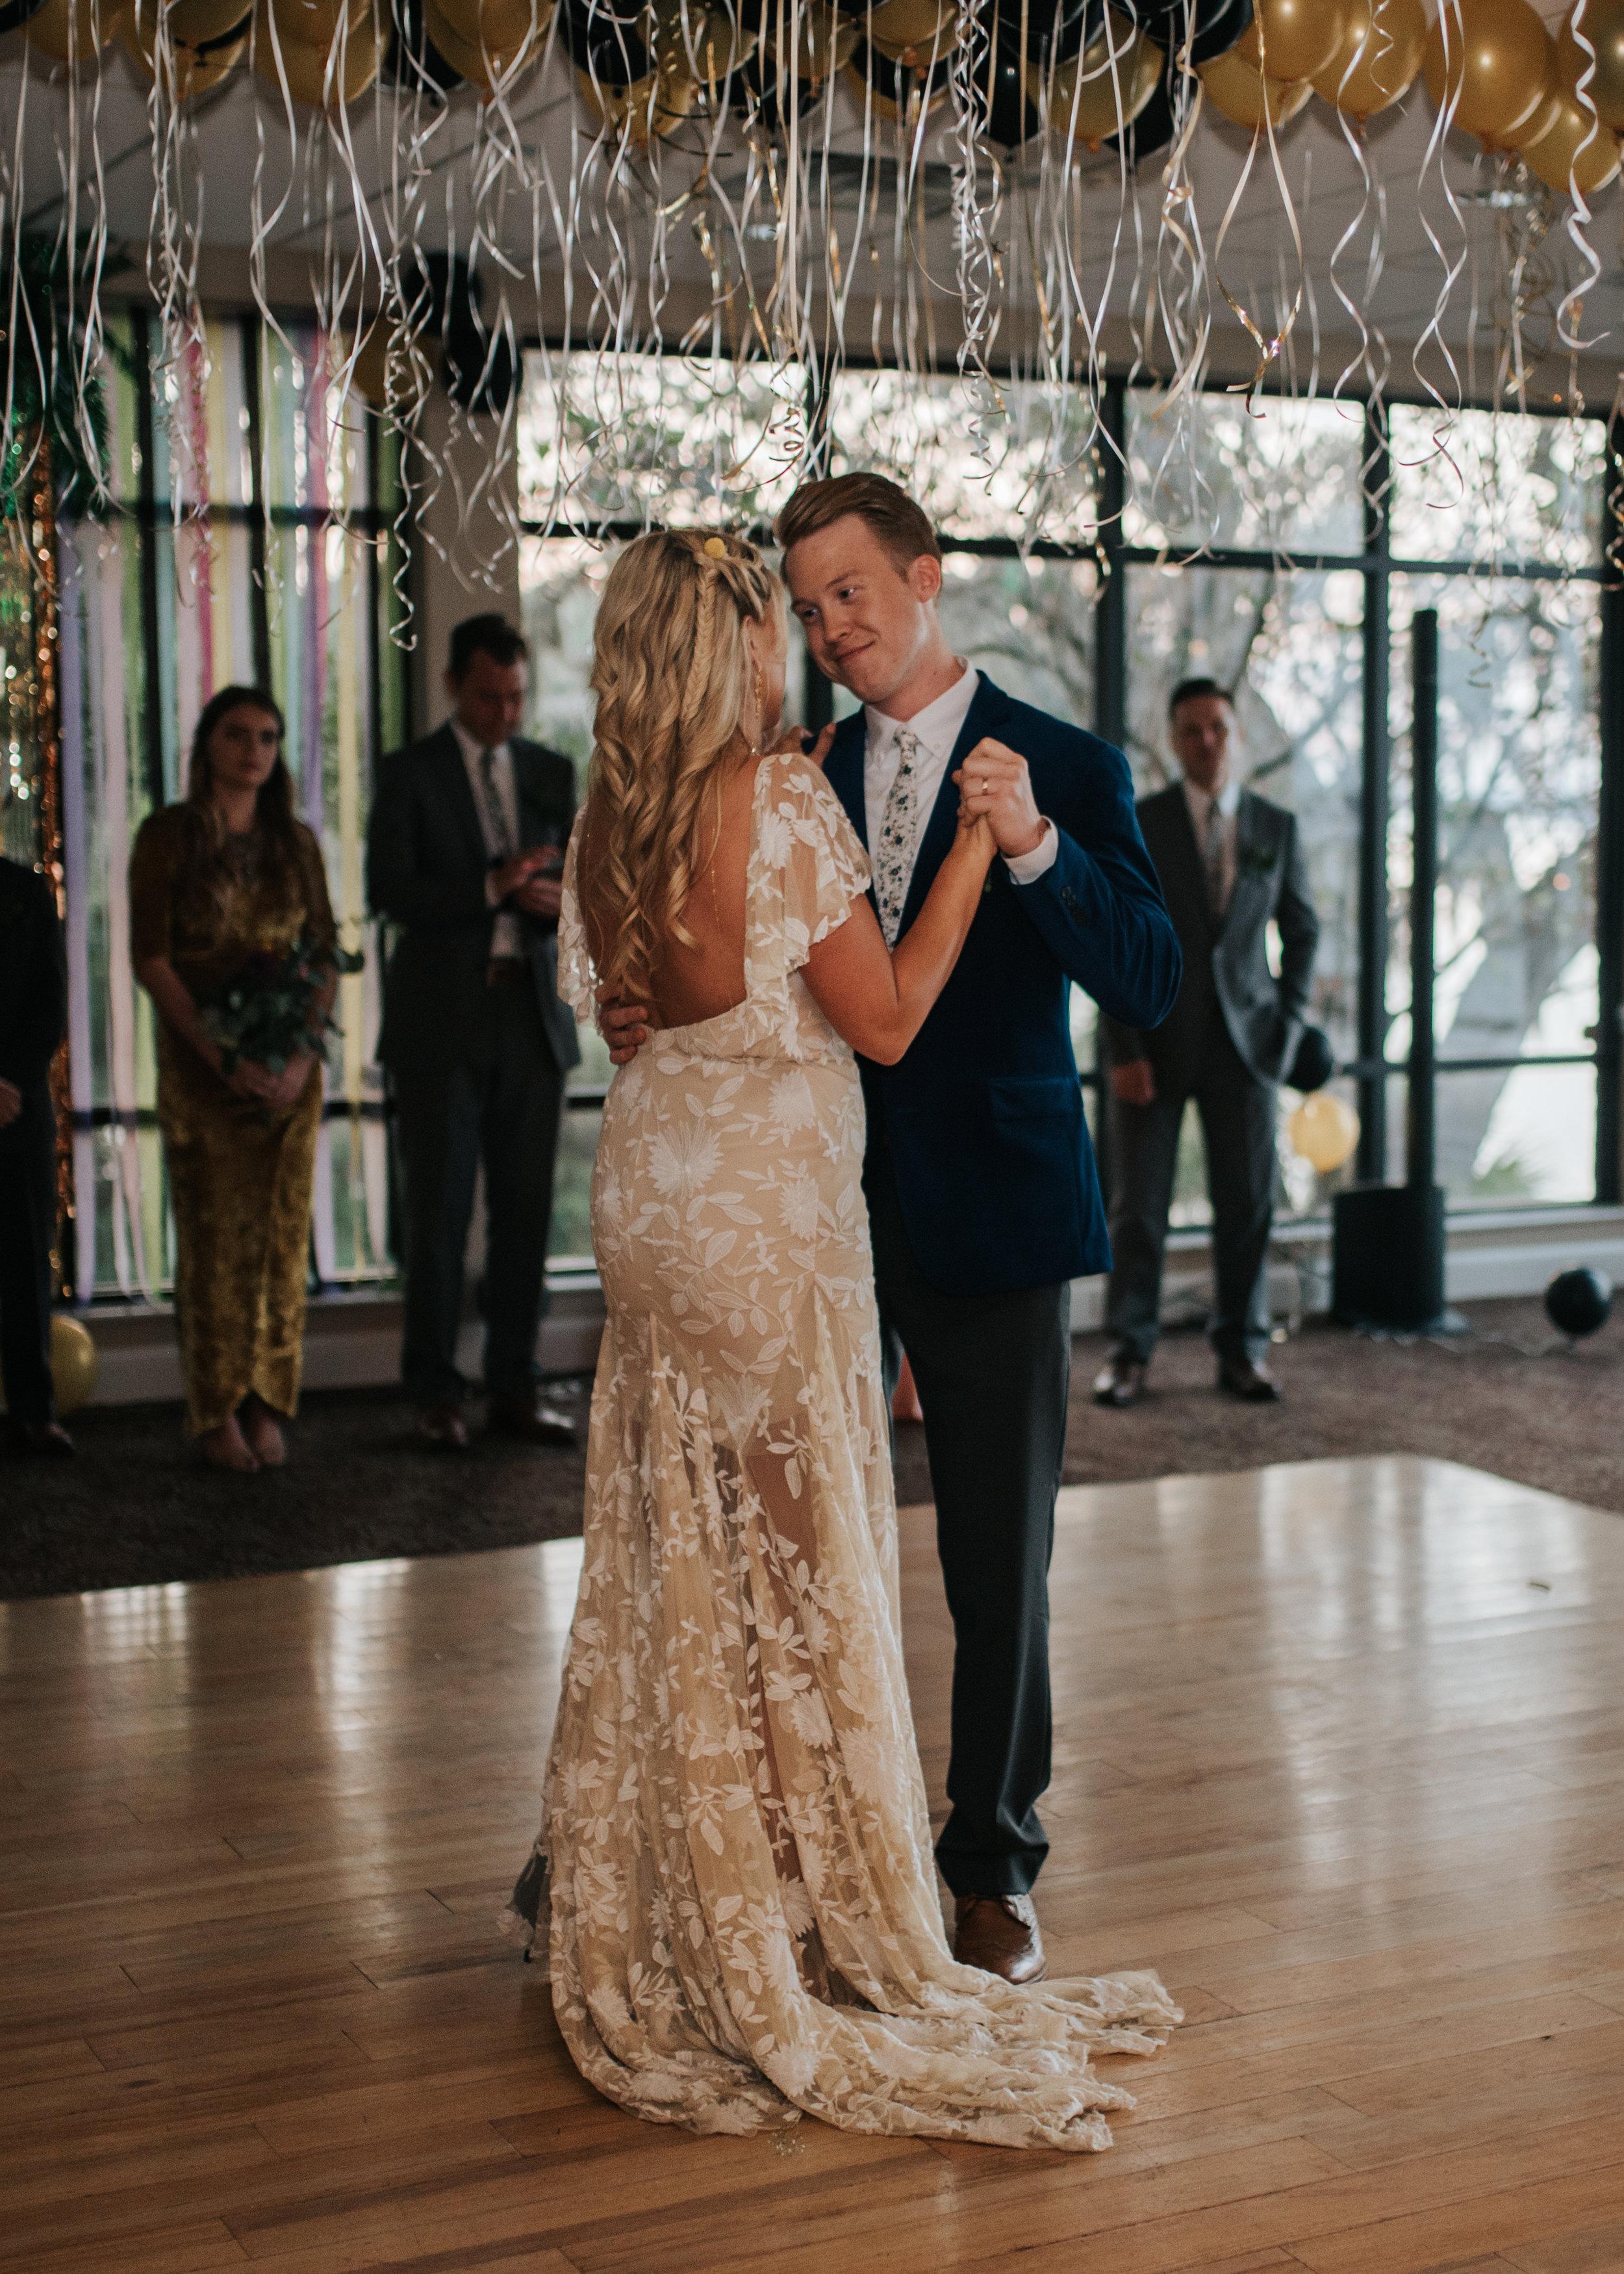 zayda-collin-panama-city-wedding-photography-trippy-bohemian-lisa-frank-wedding-dances-55.jpg